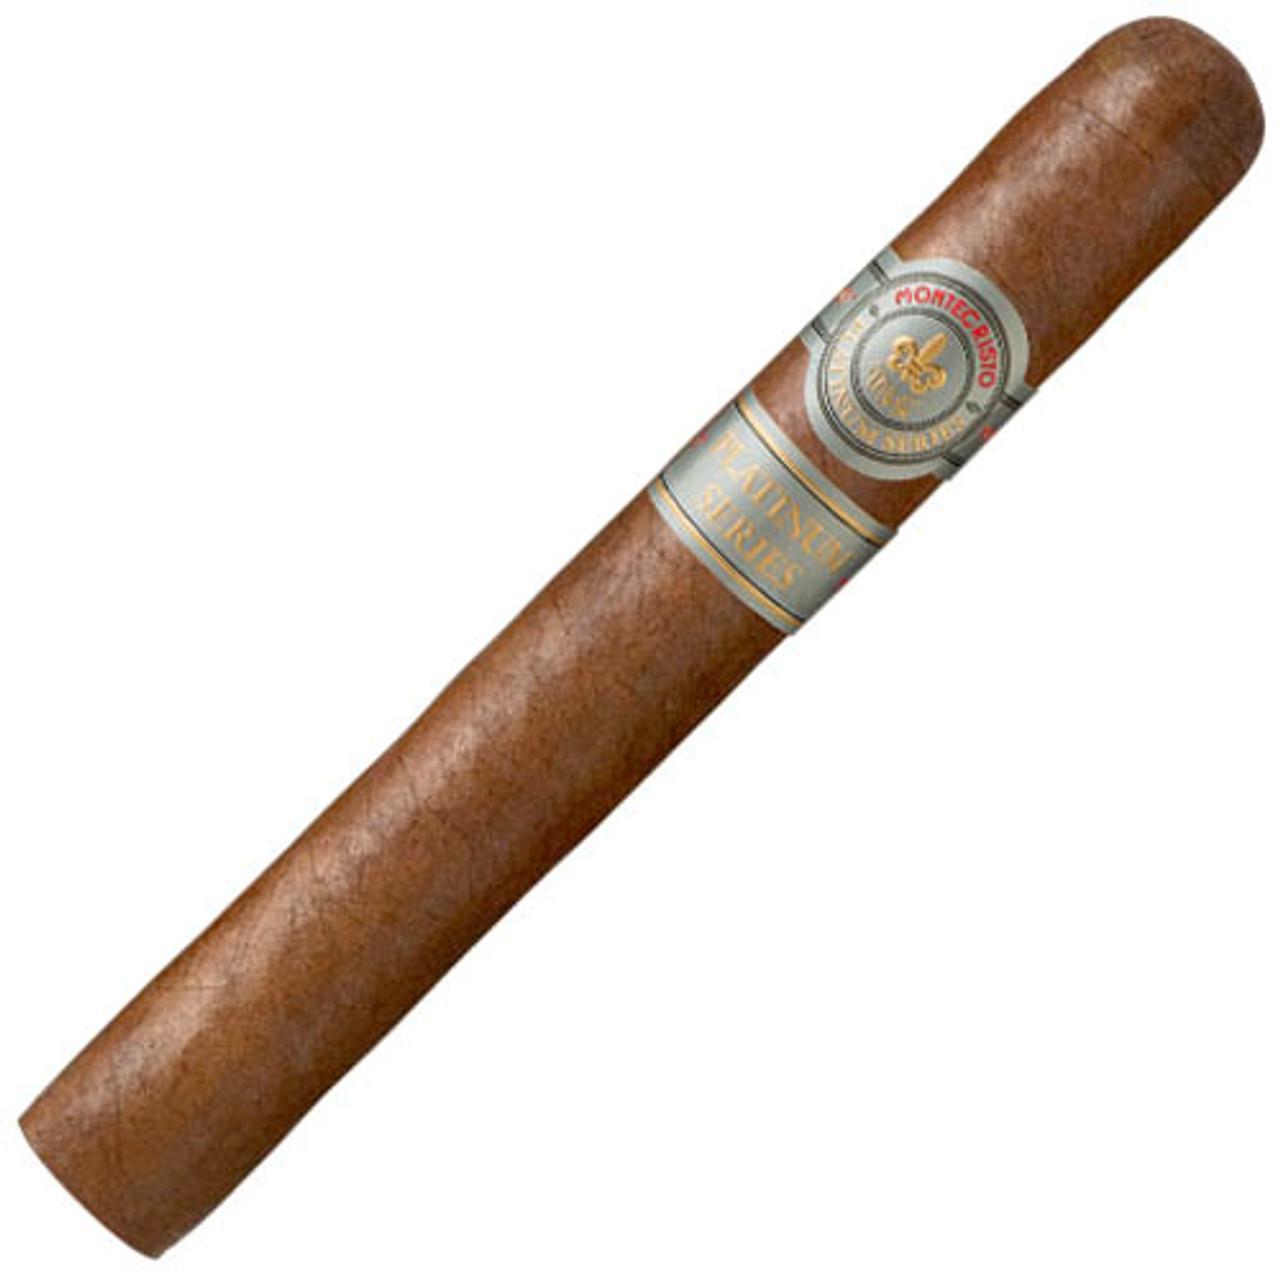 Montecristo Platinum Toro Cigars - 6 x 50 (Box of 27)